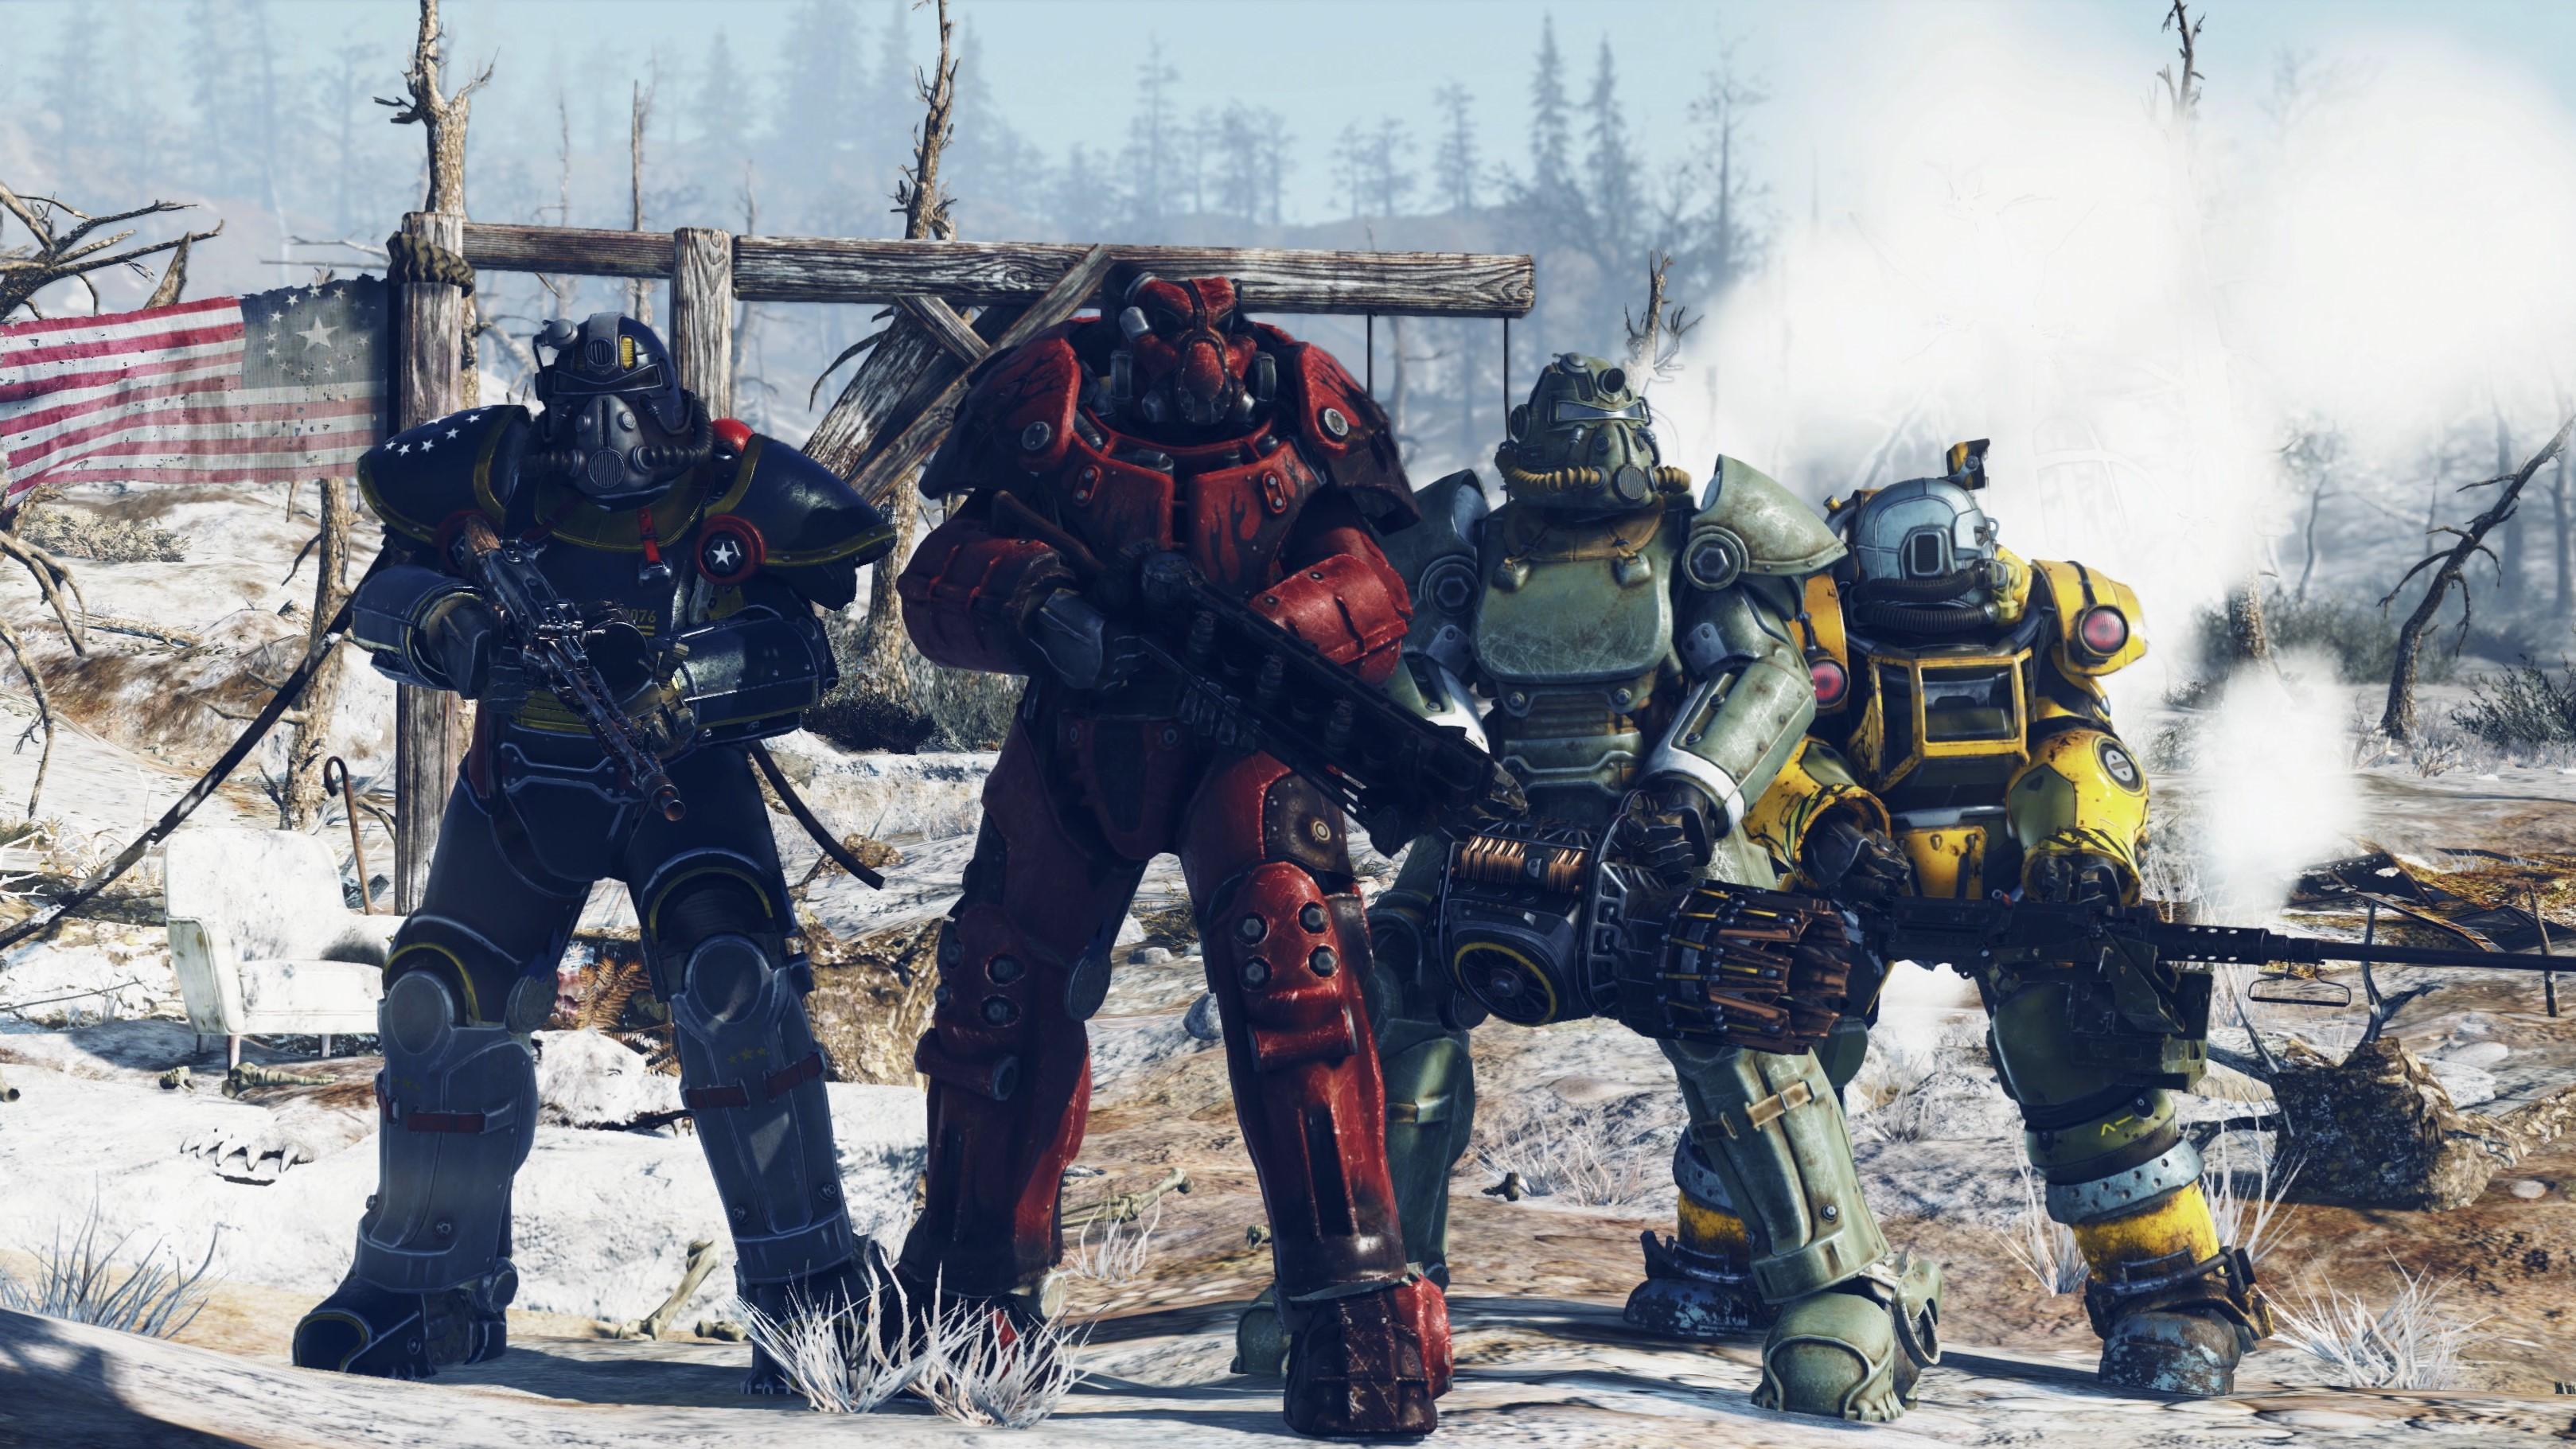 Fallout 76 power armor edition vs tricentennial edition | PC Gamer